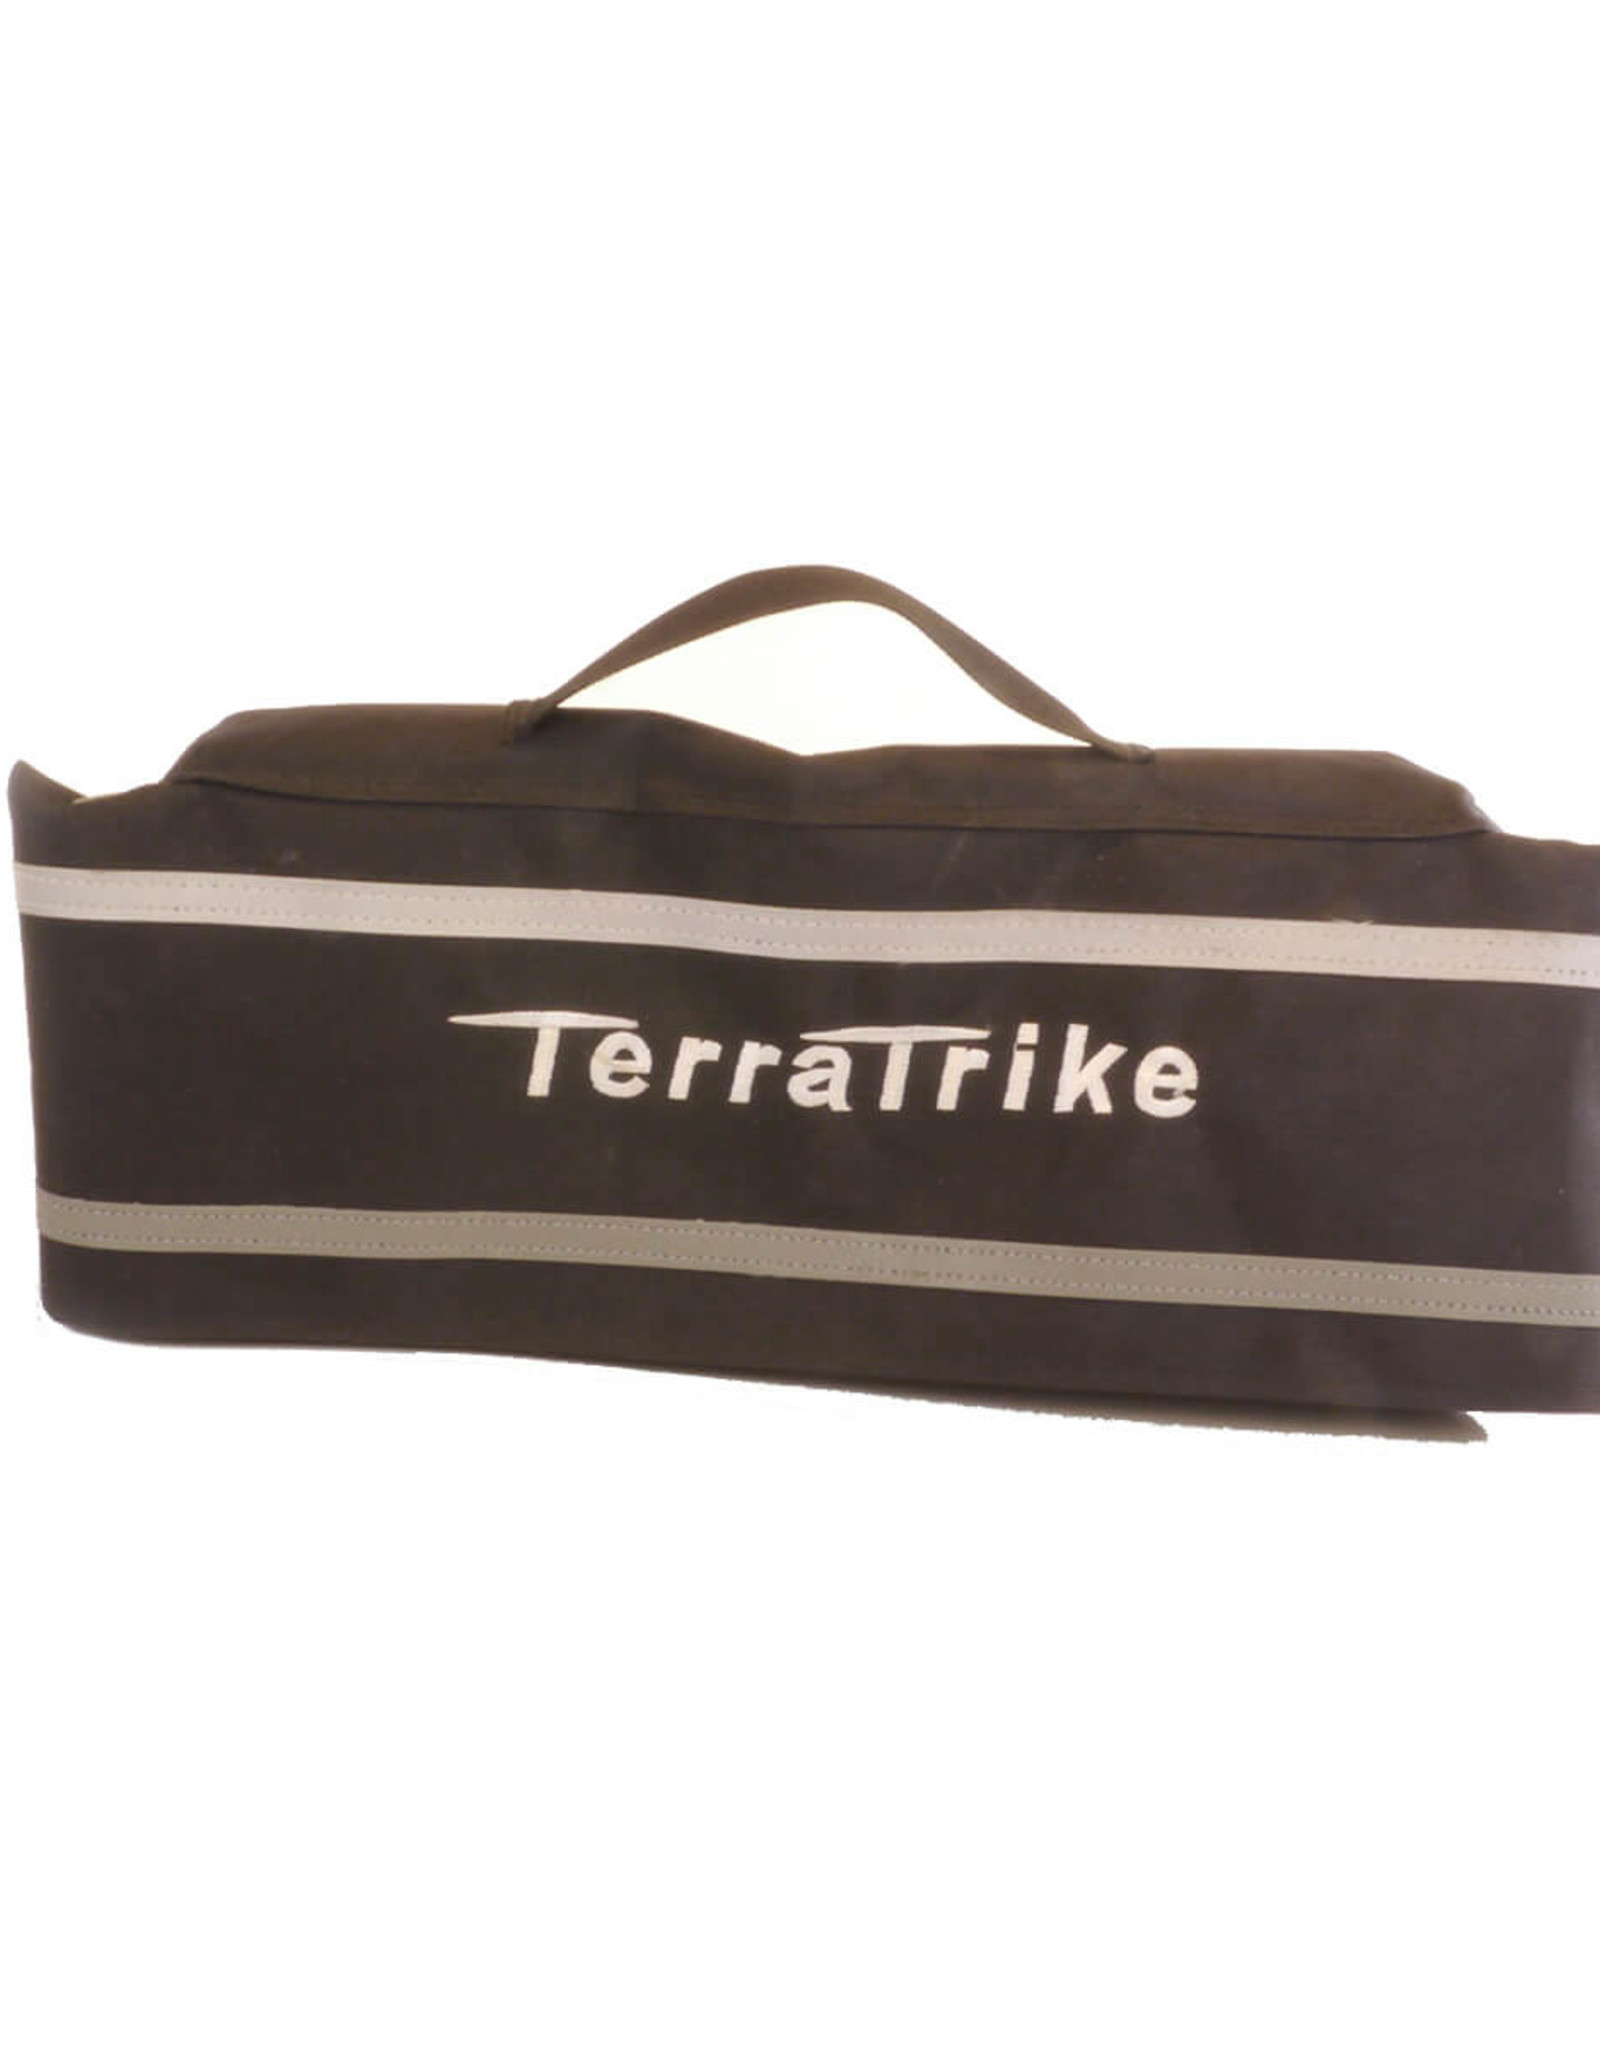 Terratrike Seat Bag - Extended Width (Silver Logo)